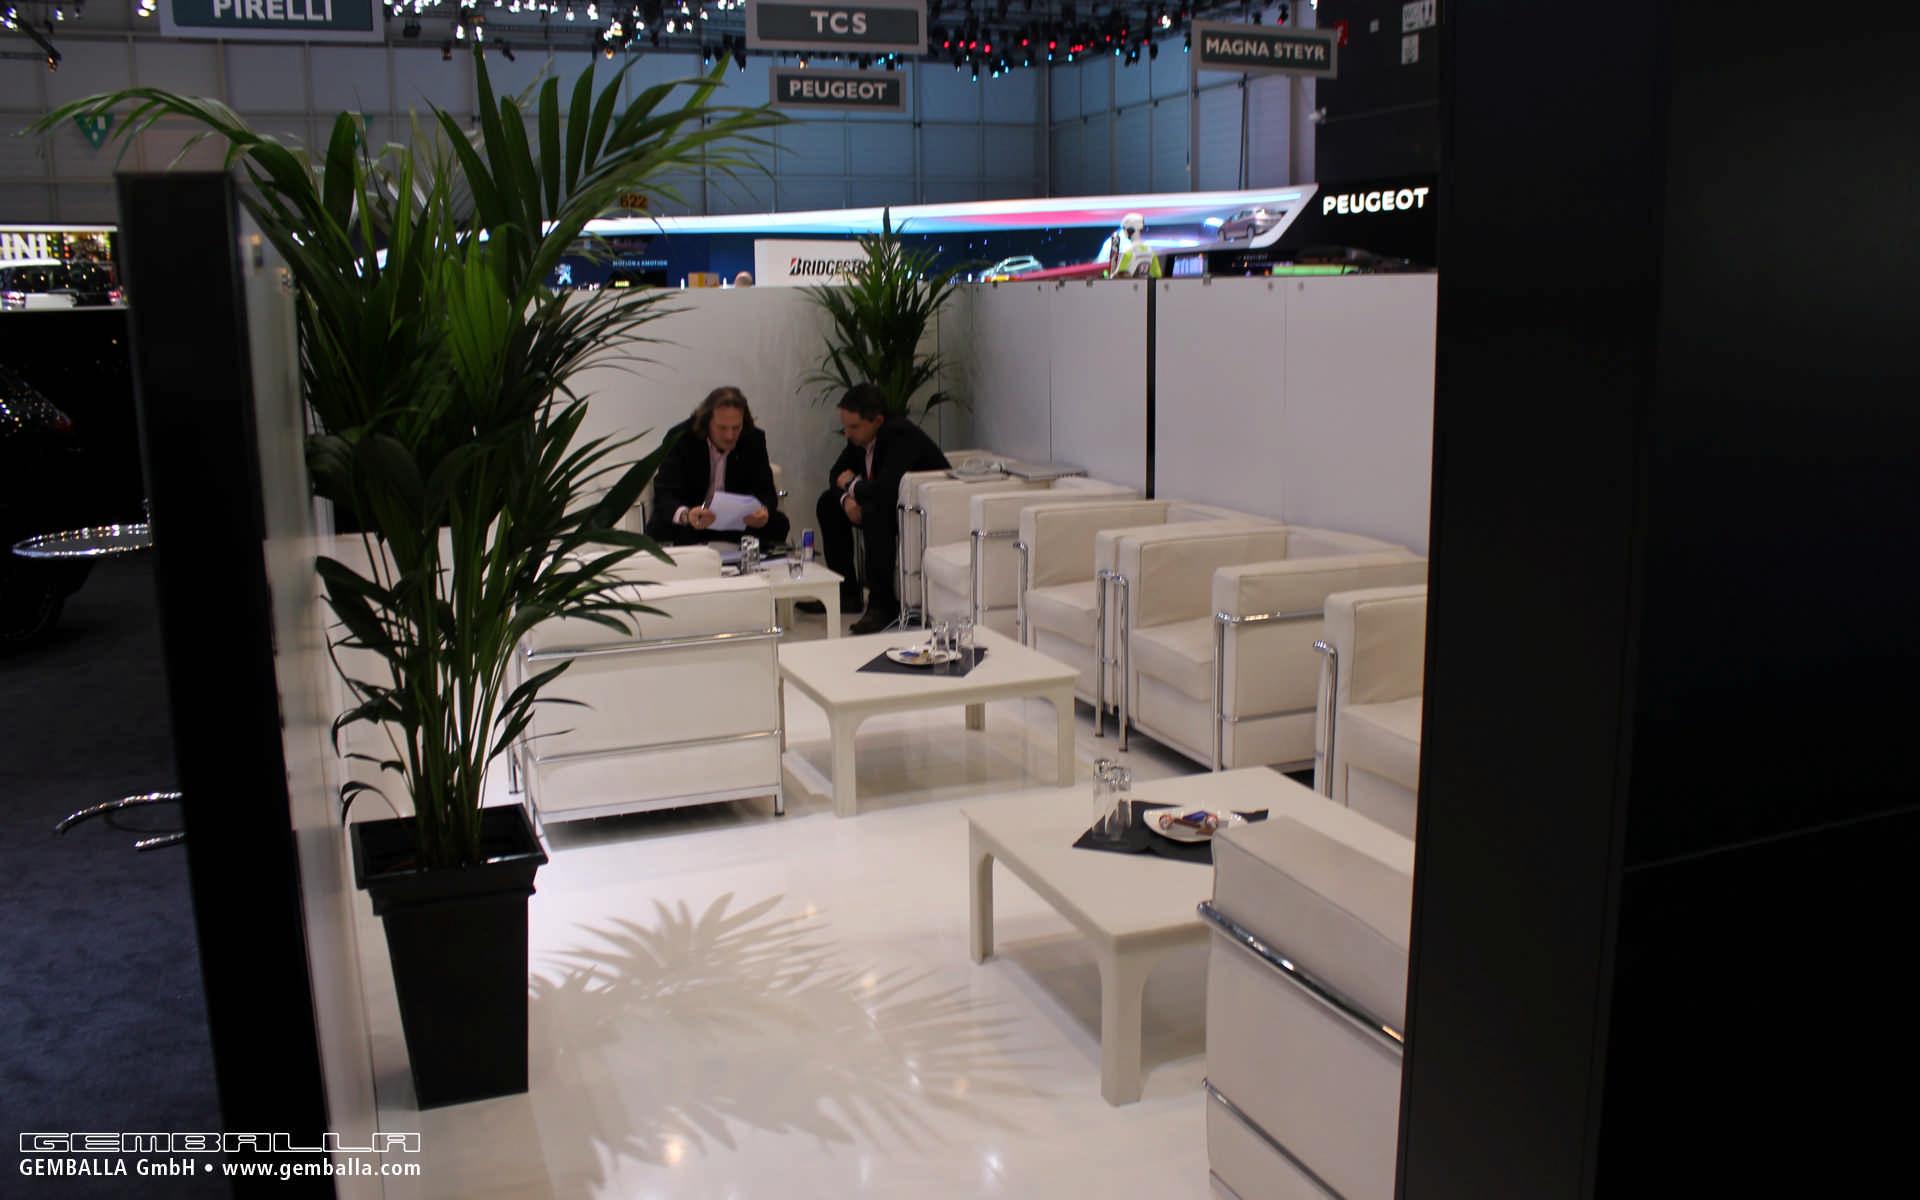 gemballa_gmbh_event_geneva_ms_2012_013